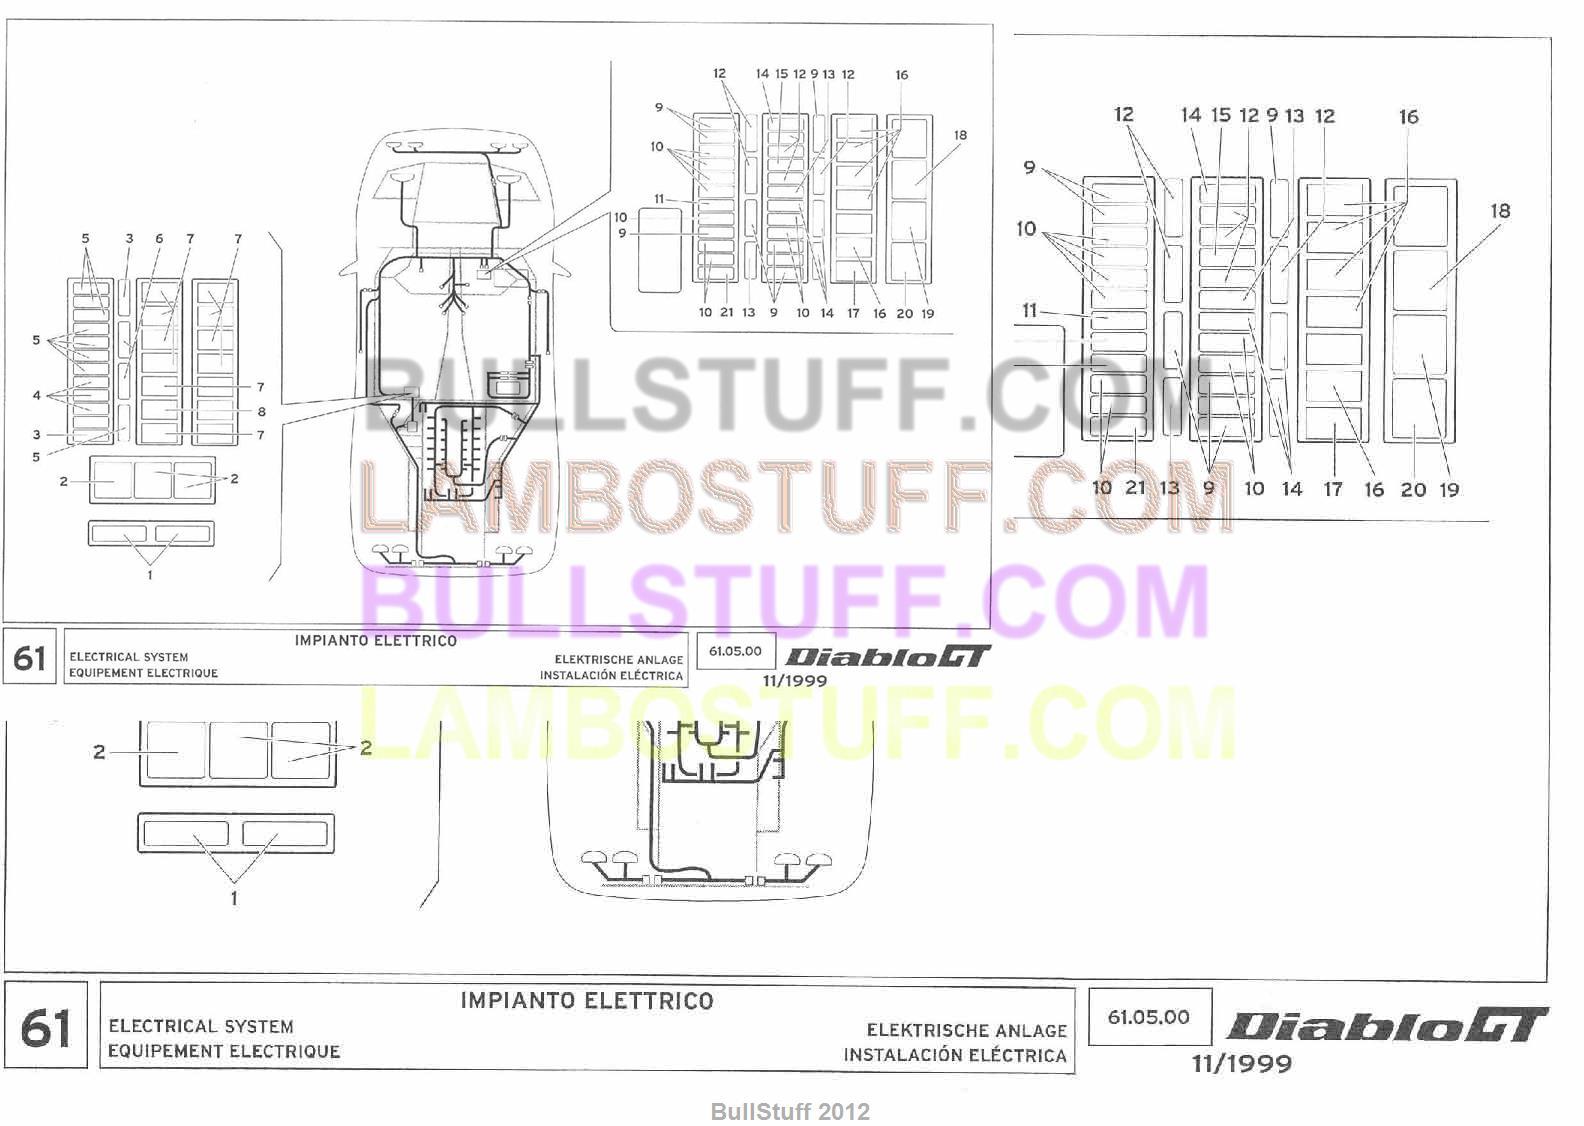 1999 lamborghini diablo gt usa electrical system (61 05 00)Diablo Wiring Diagram Get Free Image About Wiring Diagram #18